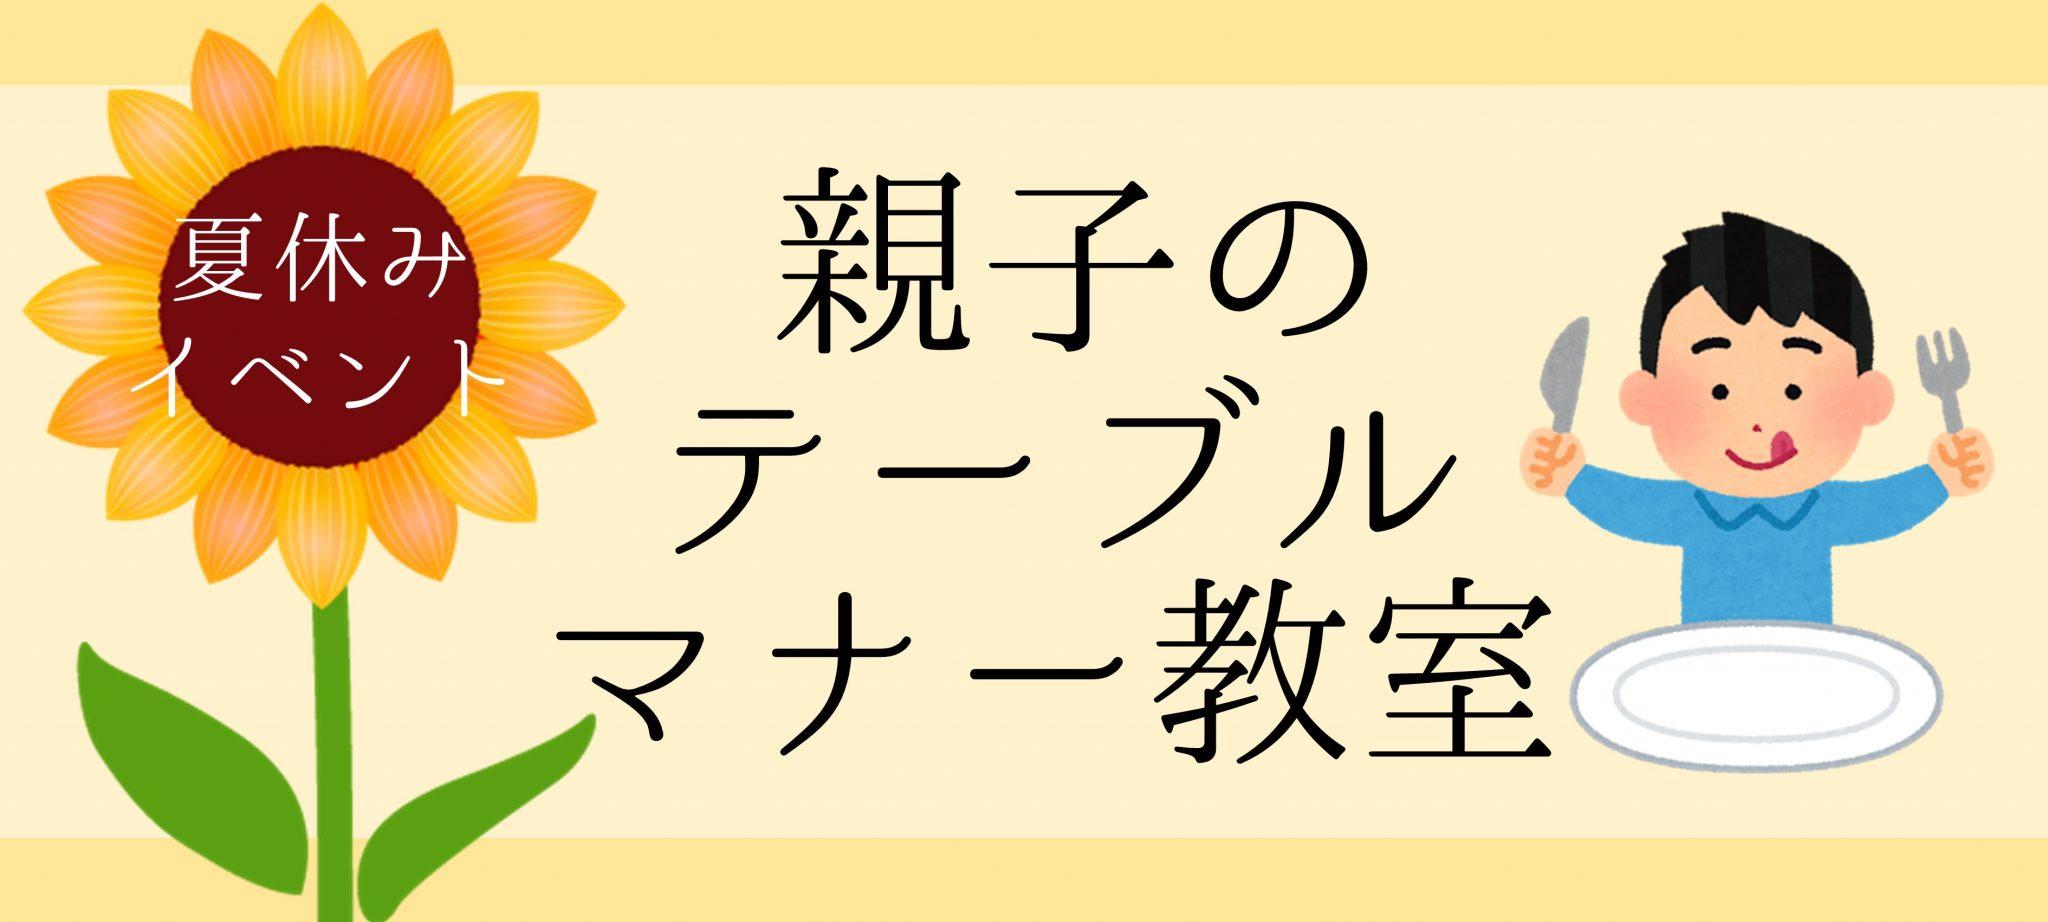 【NEW】夏休みイベント 親子のテーブルマナー教室